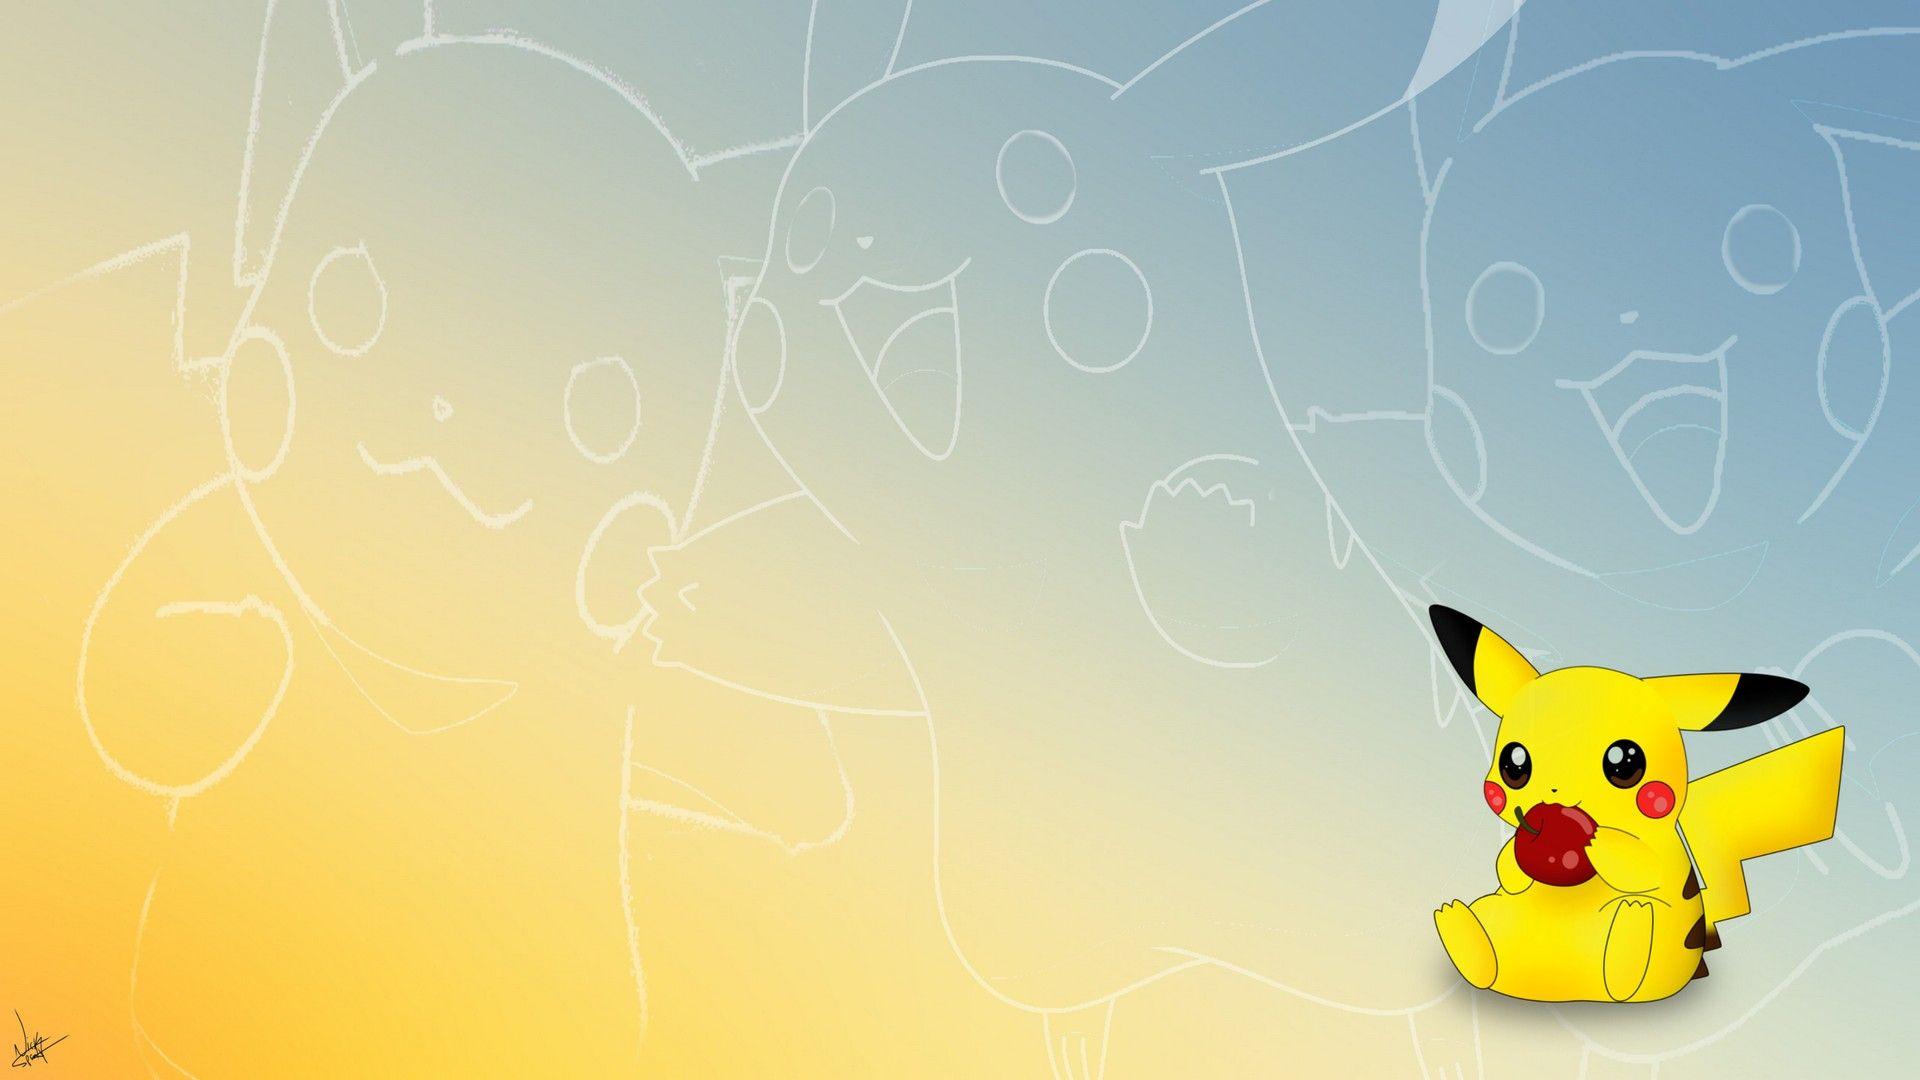 Desktop Wallpaper Light Yellow (With images) Pikachu